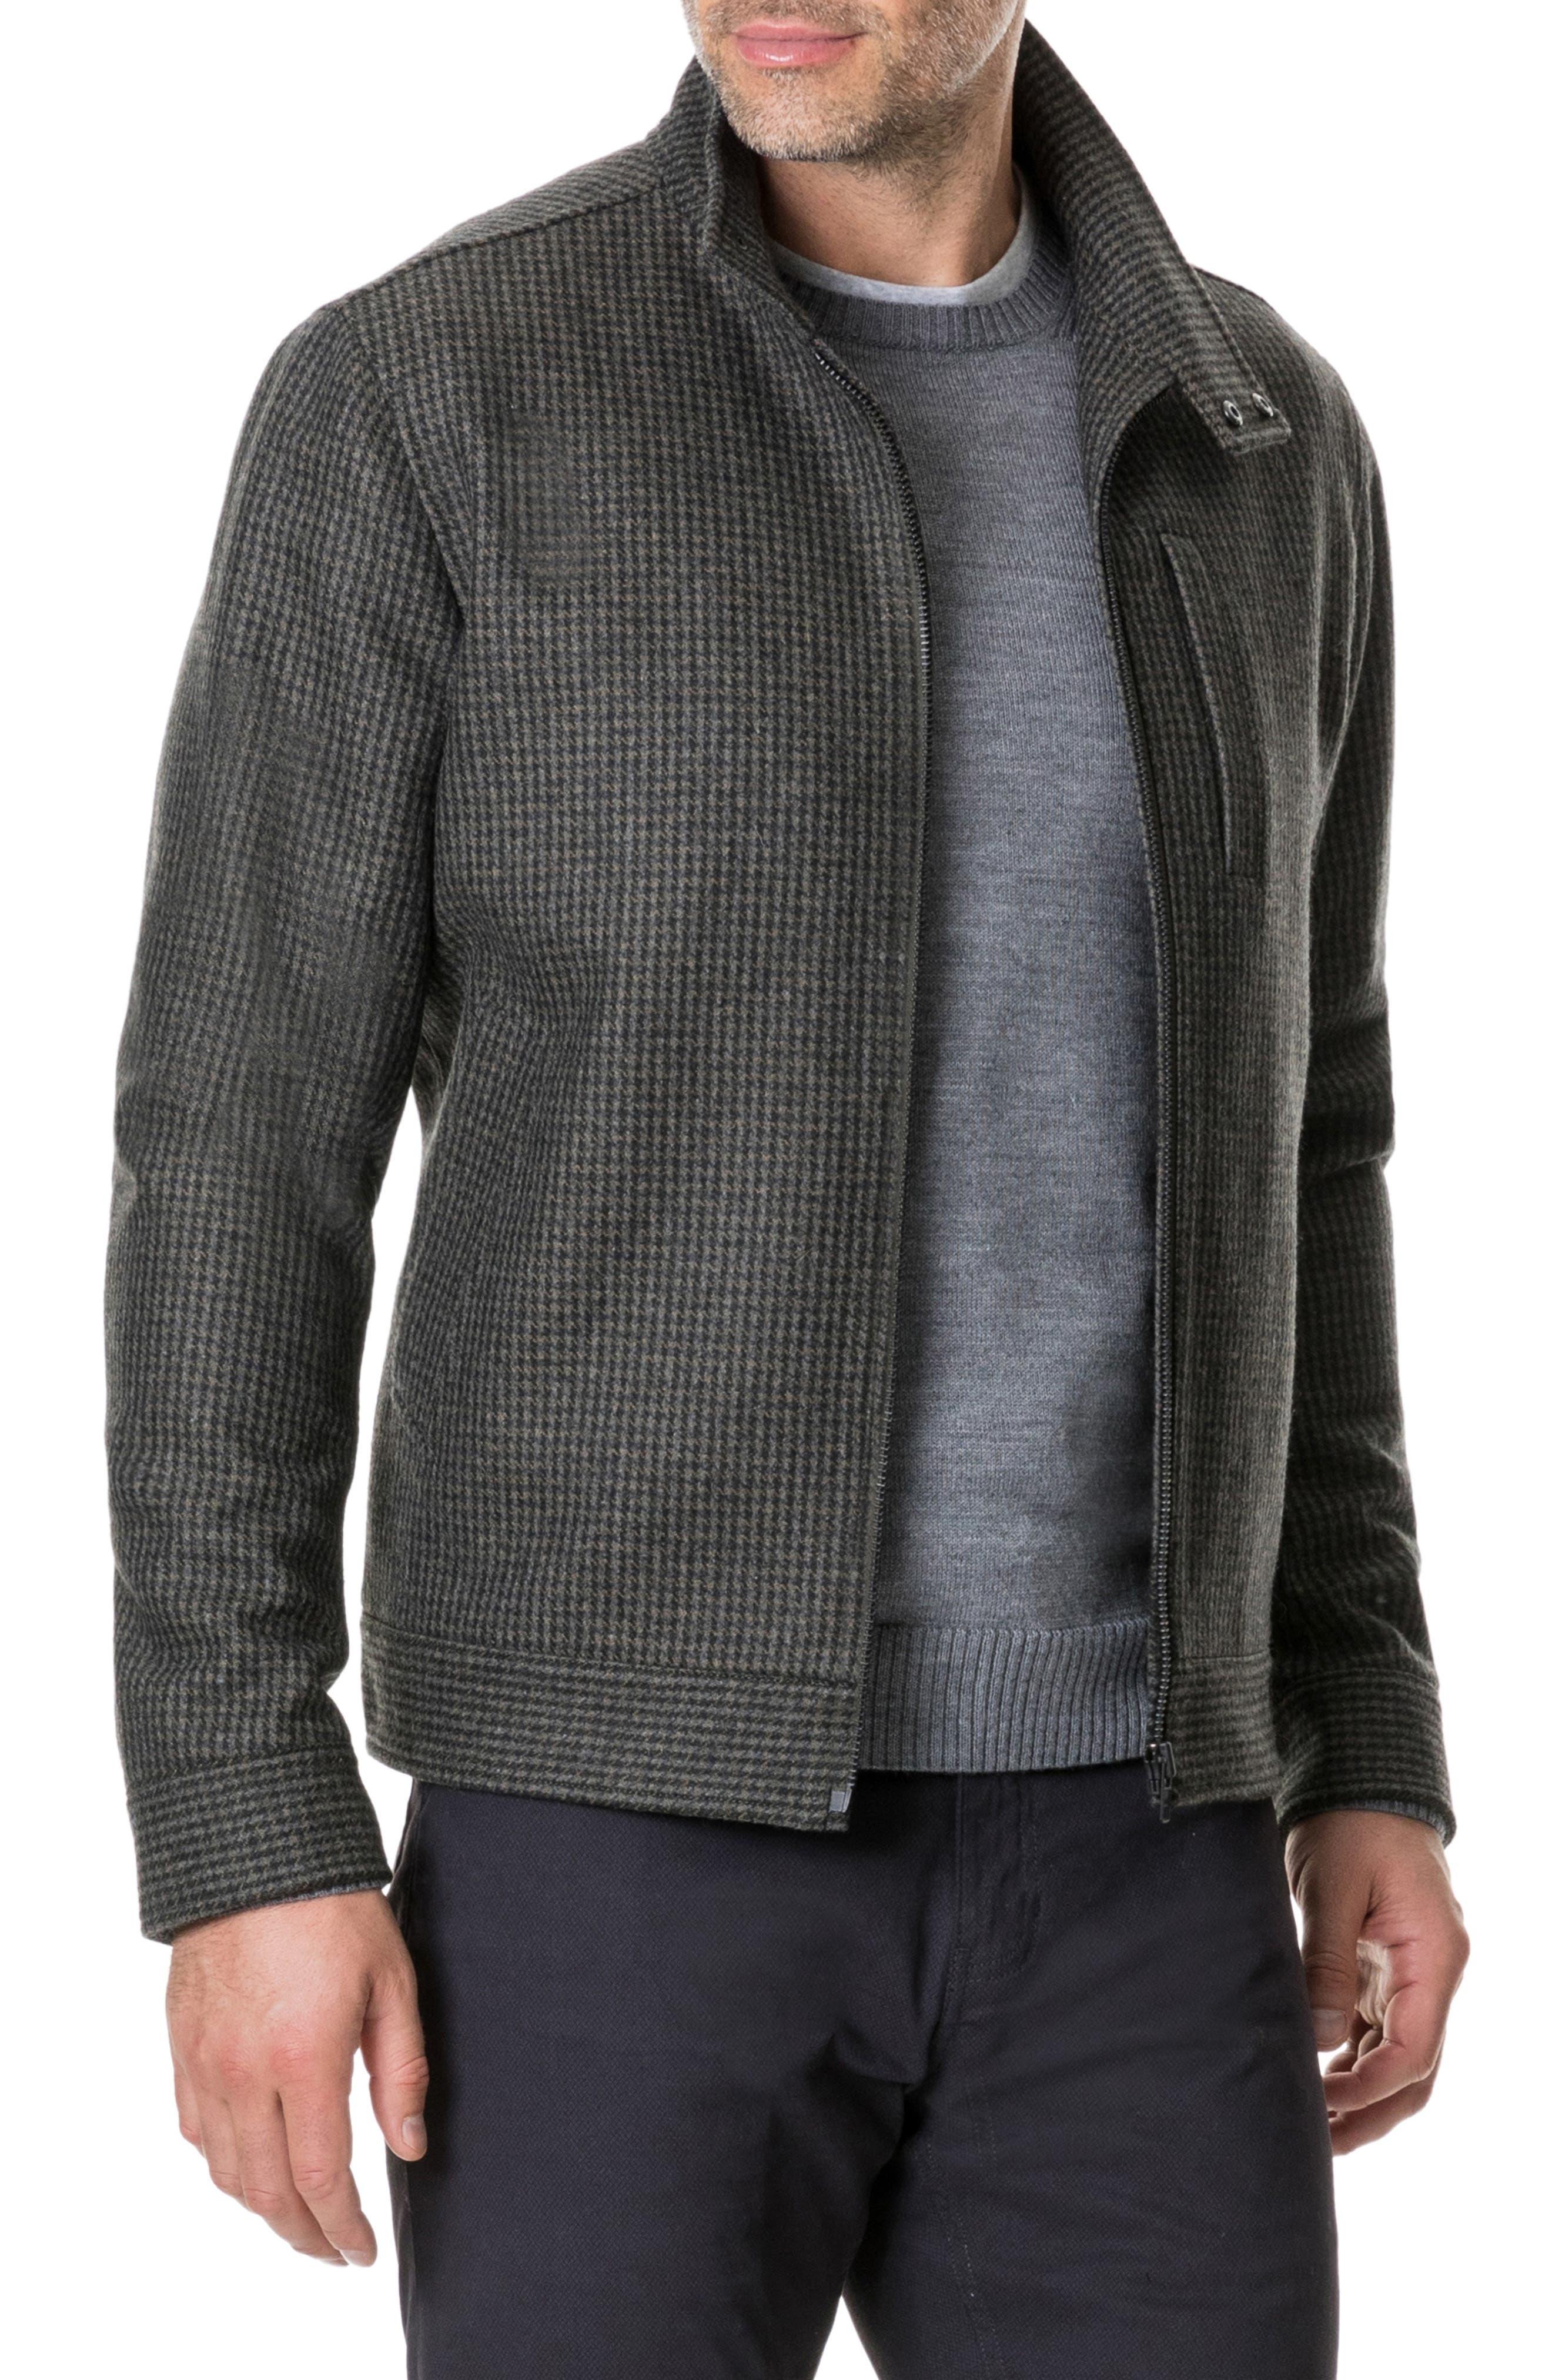 Oyster Cove Regular Fit Wool Blend Jacket,                             Alternate thumbnail 3, color,                             OLIVE